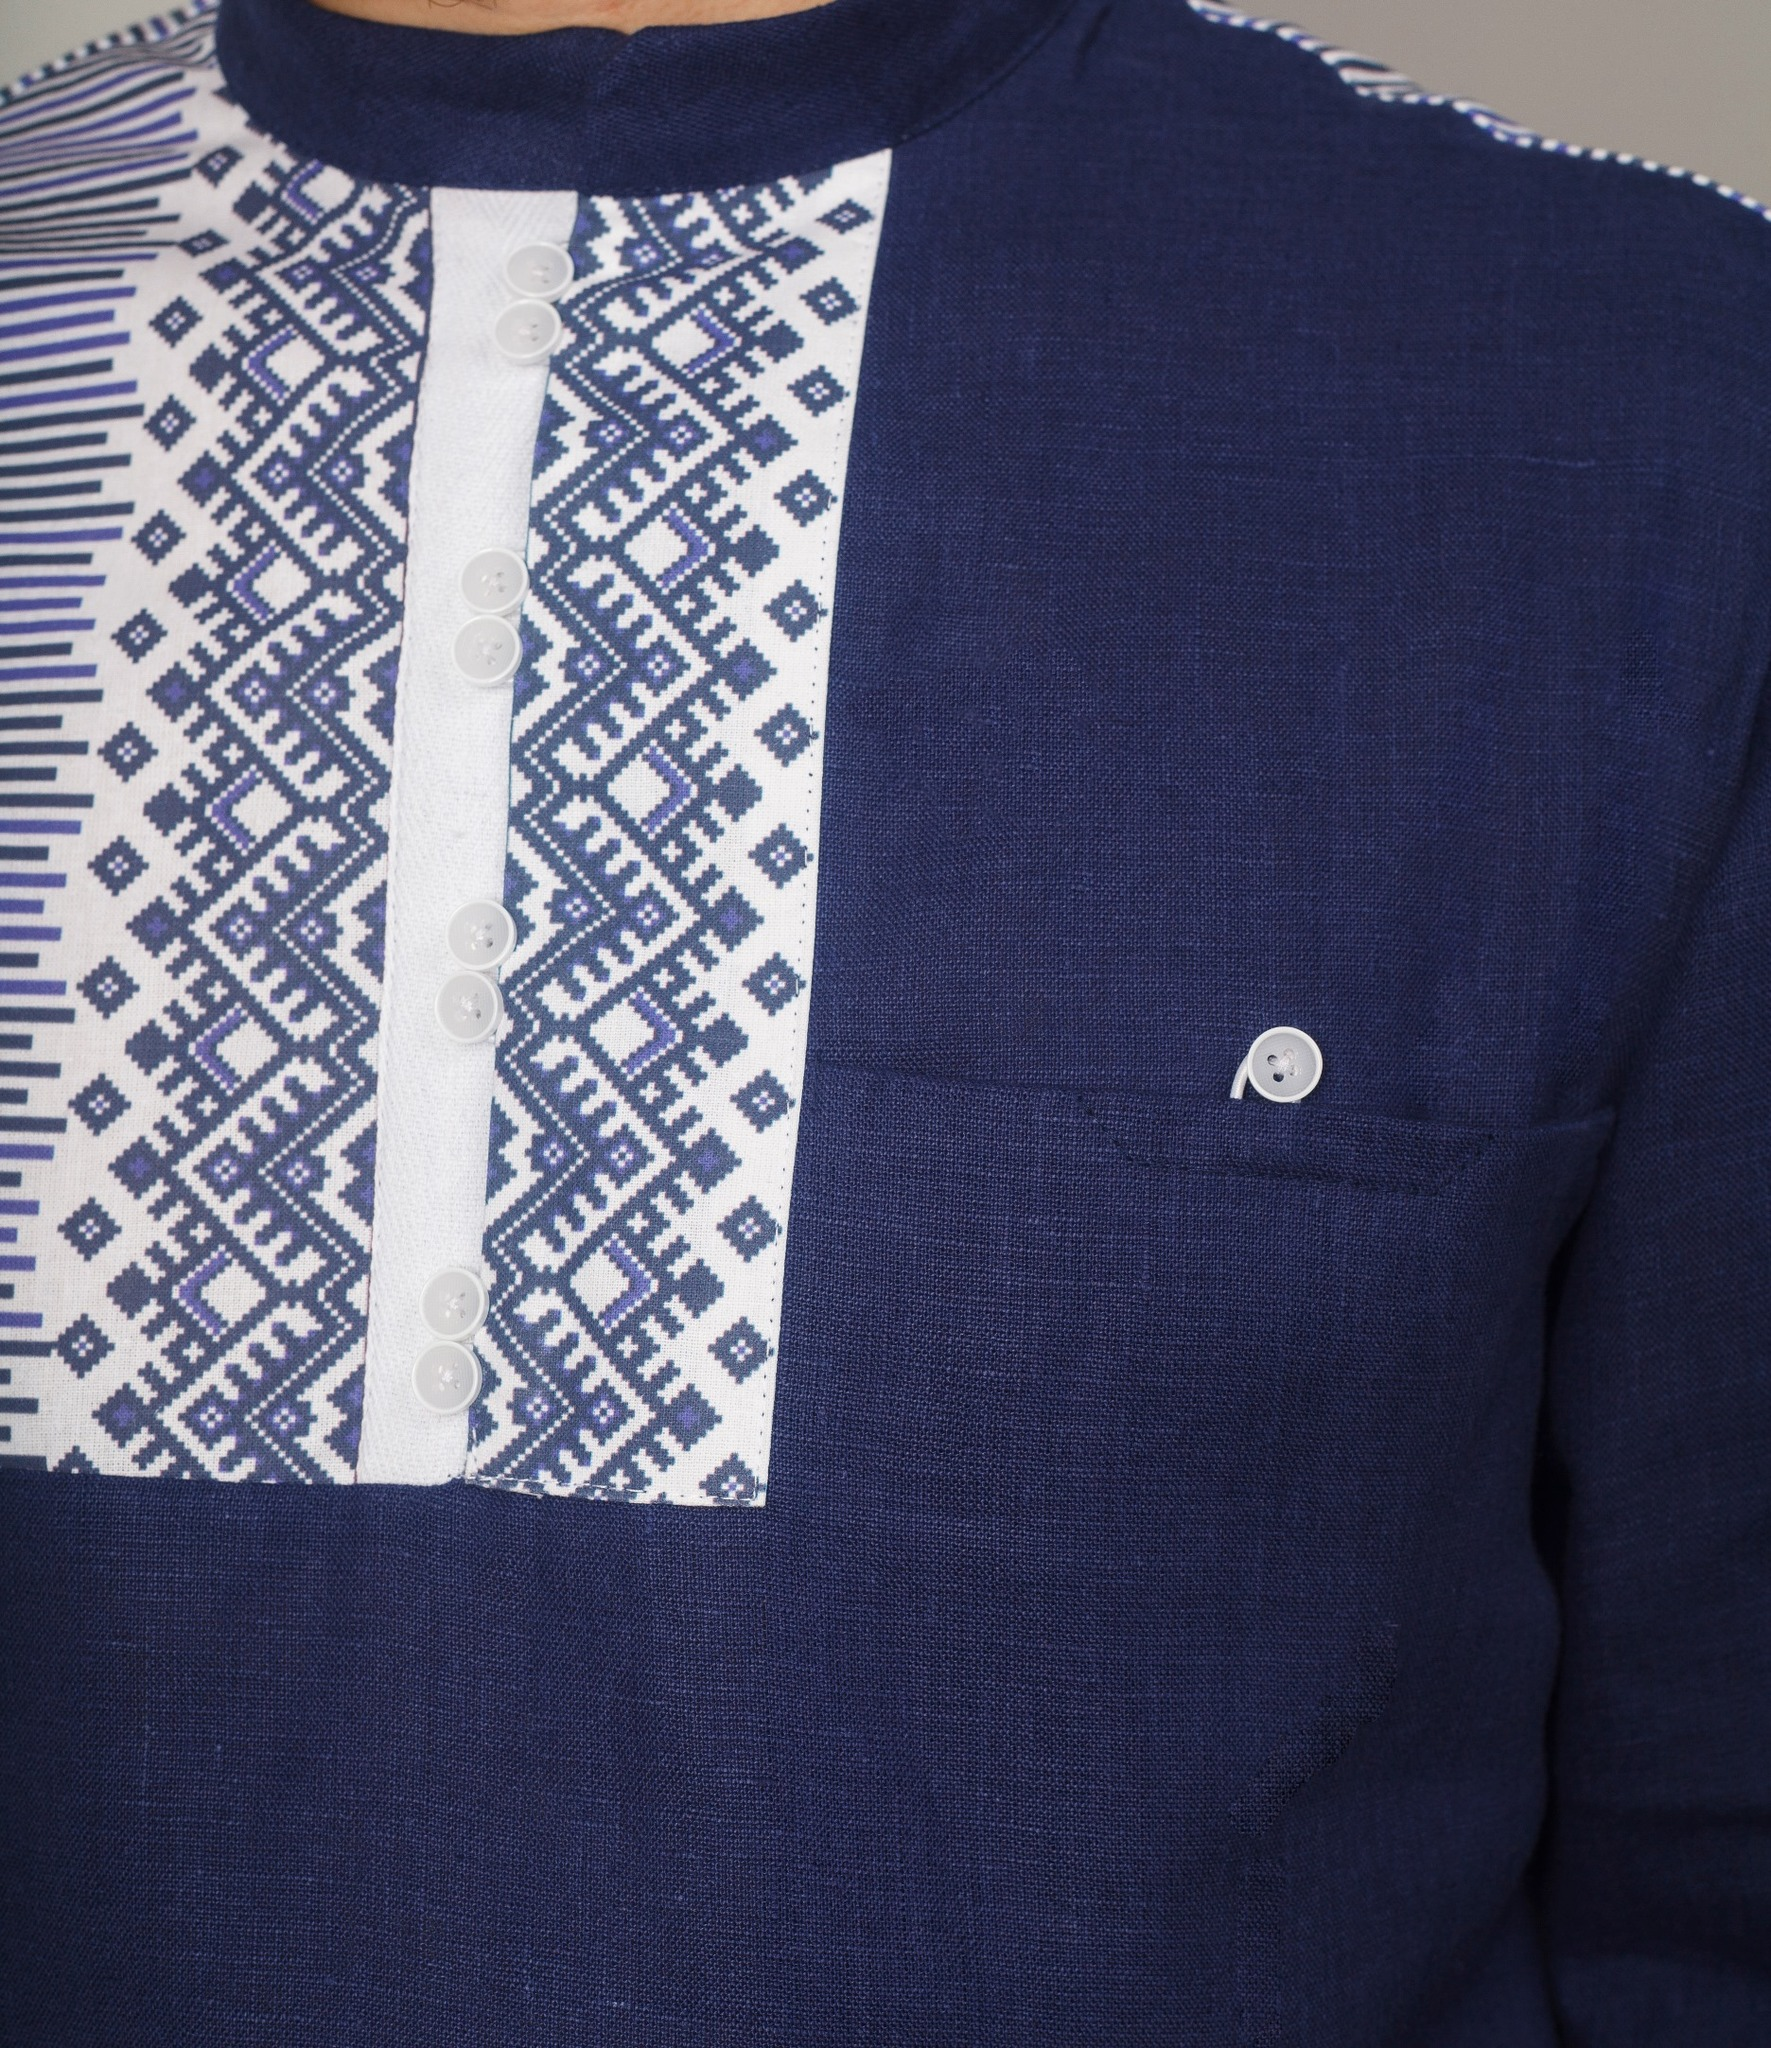 Рубашка мужская Сибирская карман